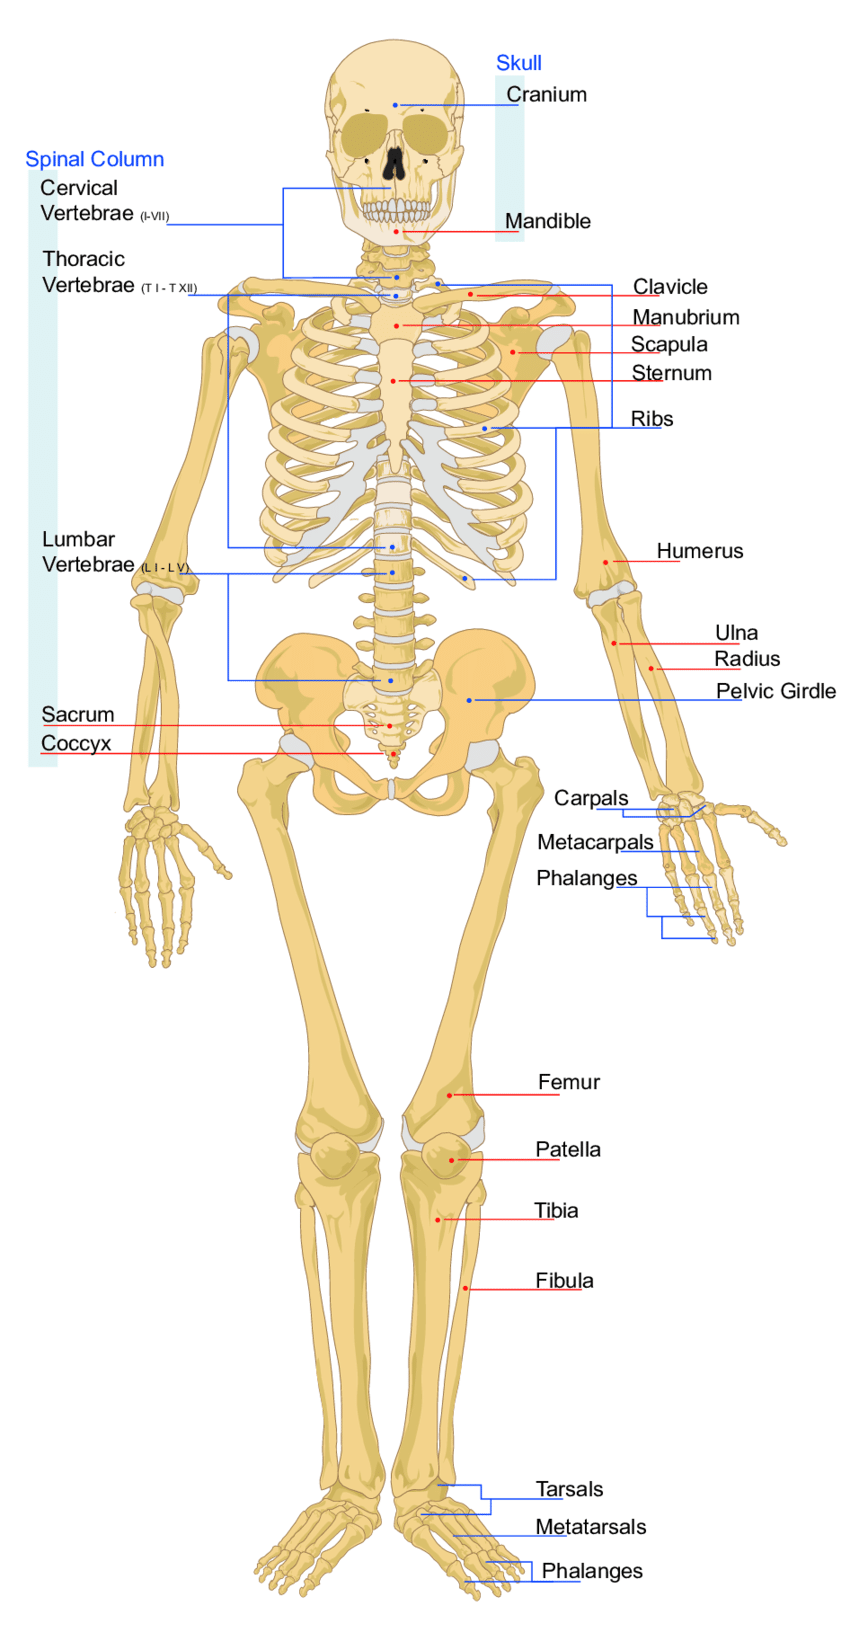 medium resolution of figure a 3 diagram of major human body bones source wikimedia 206 bones of the human body diagram human body bones diagram